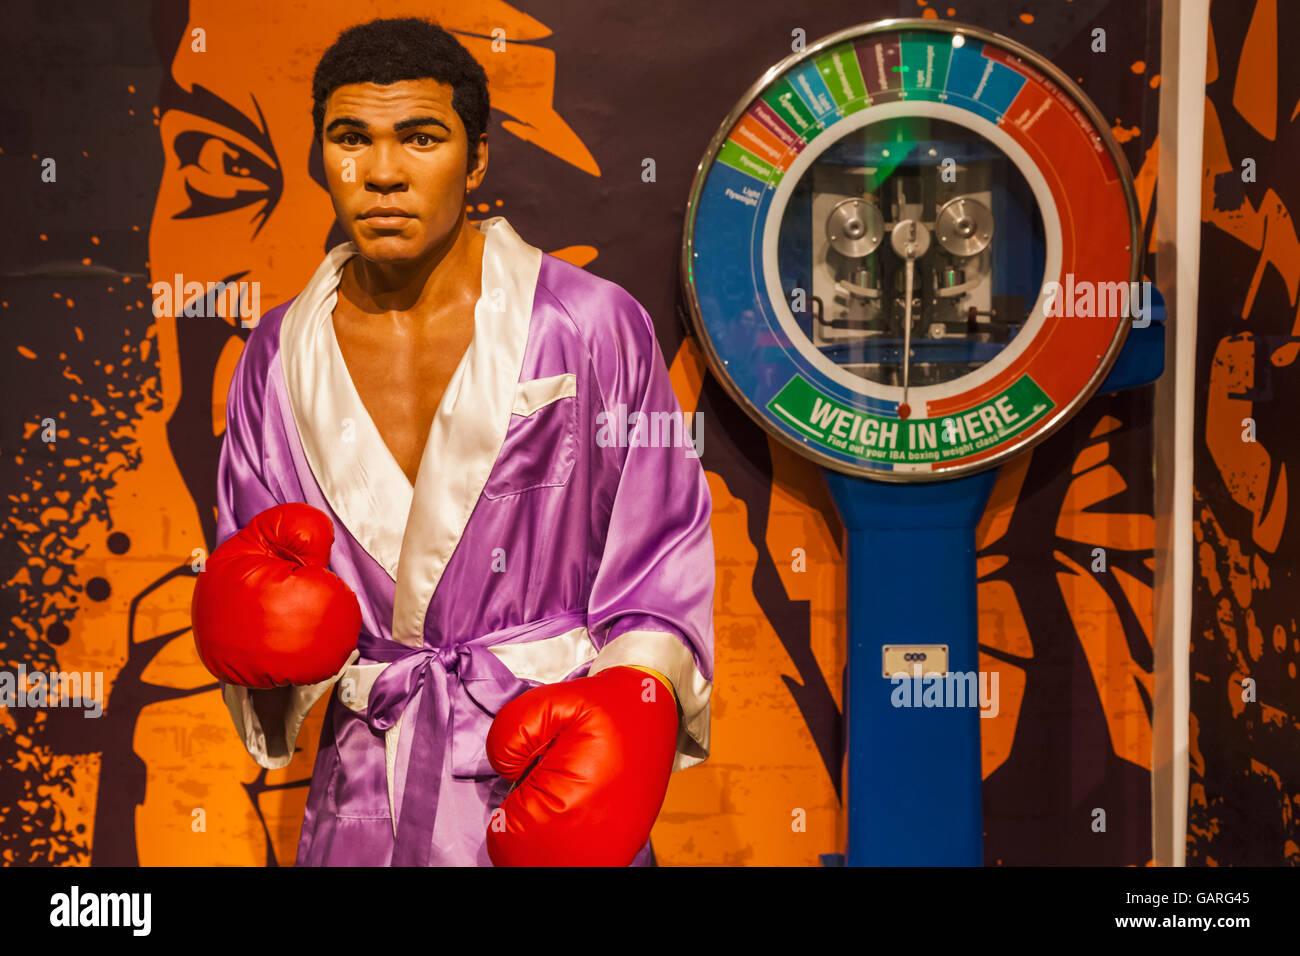 England, London, Madame Tussauds, Wax Figure of Muhammad Ali - Stock Image